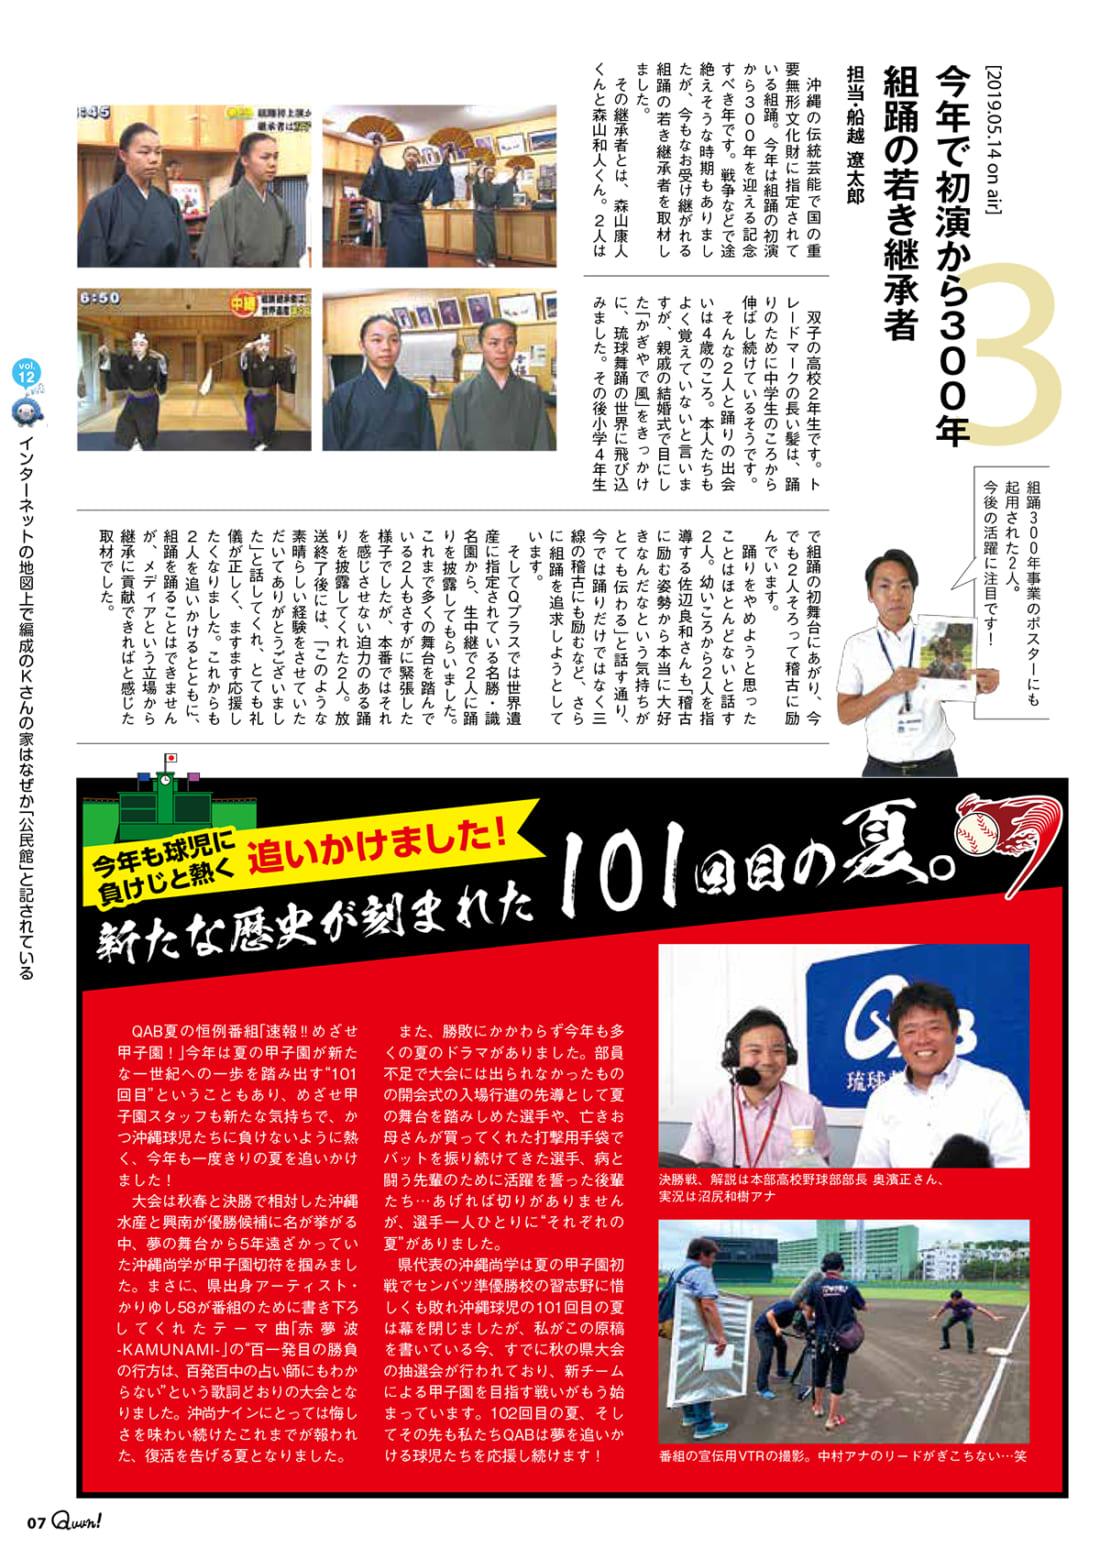 https://www.qab.co.jp/qgoro/wp-content/uploads/quun_1209-1100x1558.jpg